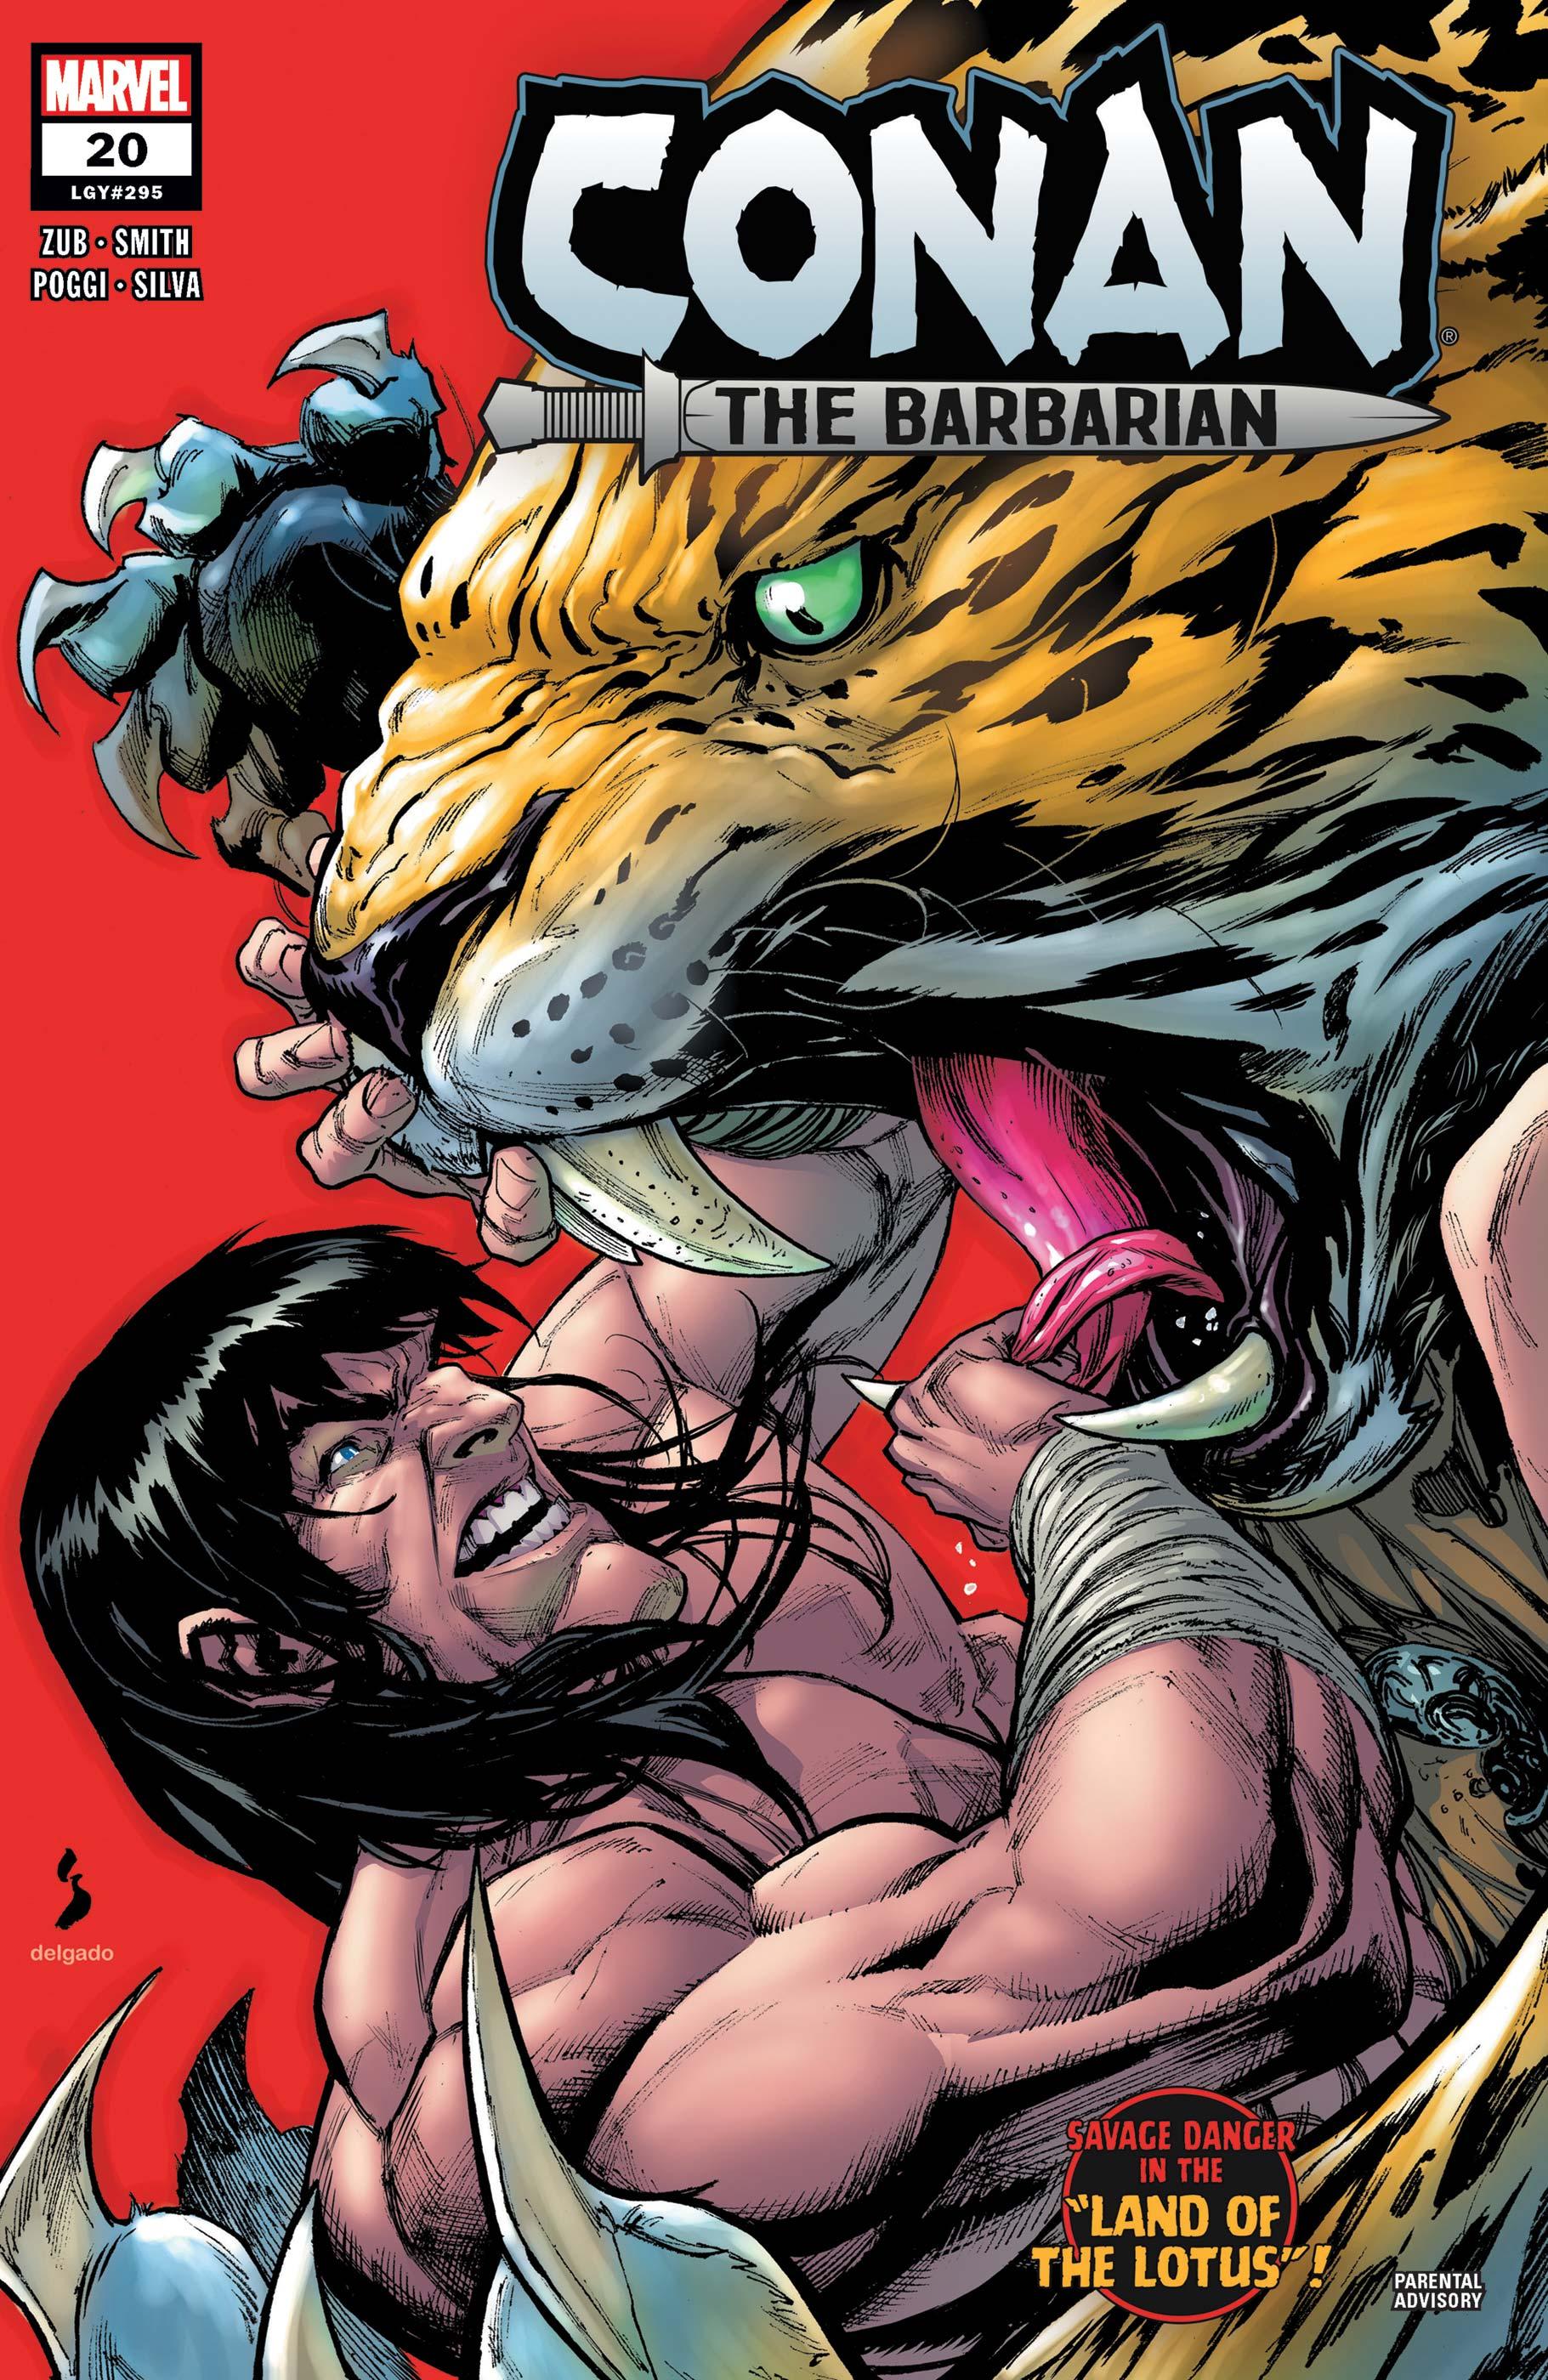 Conan the Barbarian (2019) #20